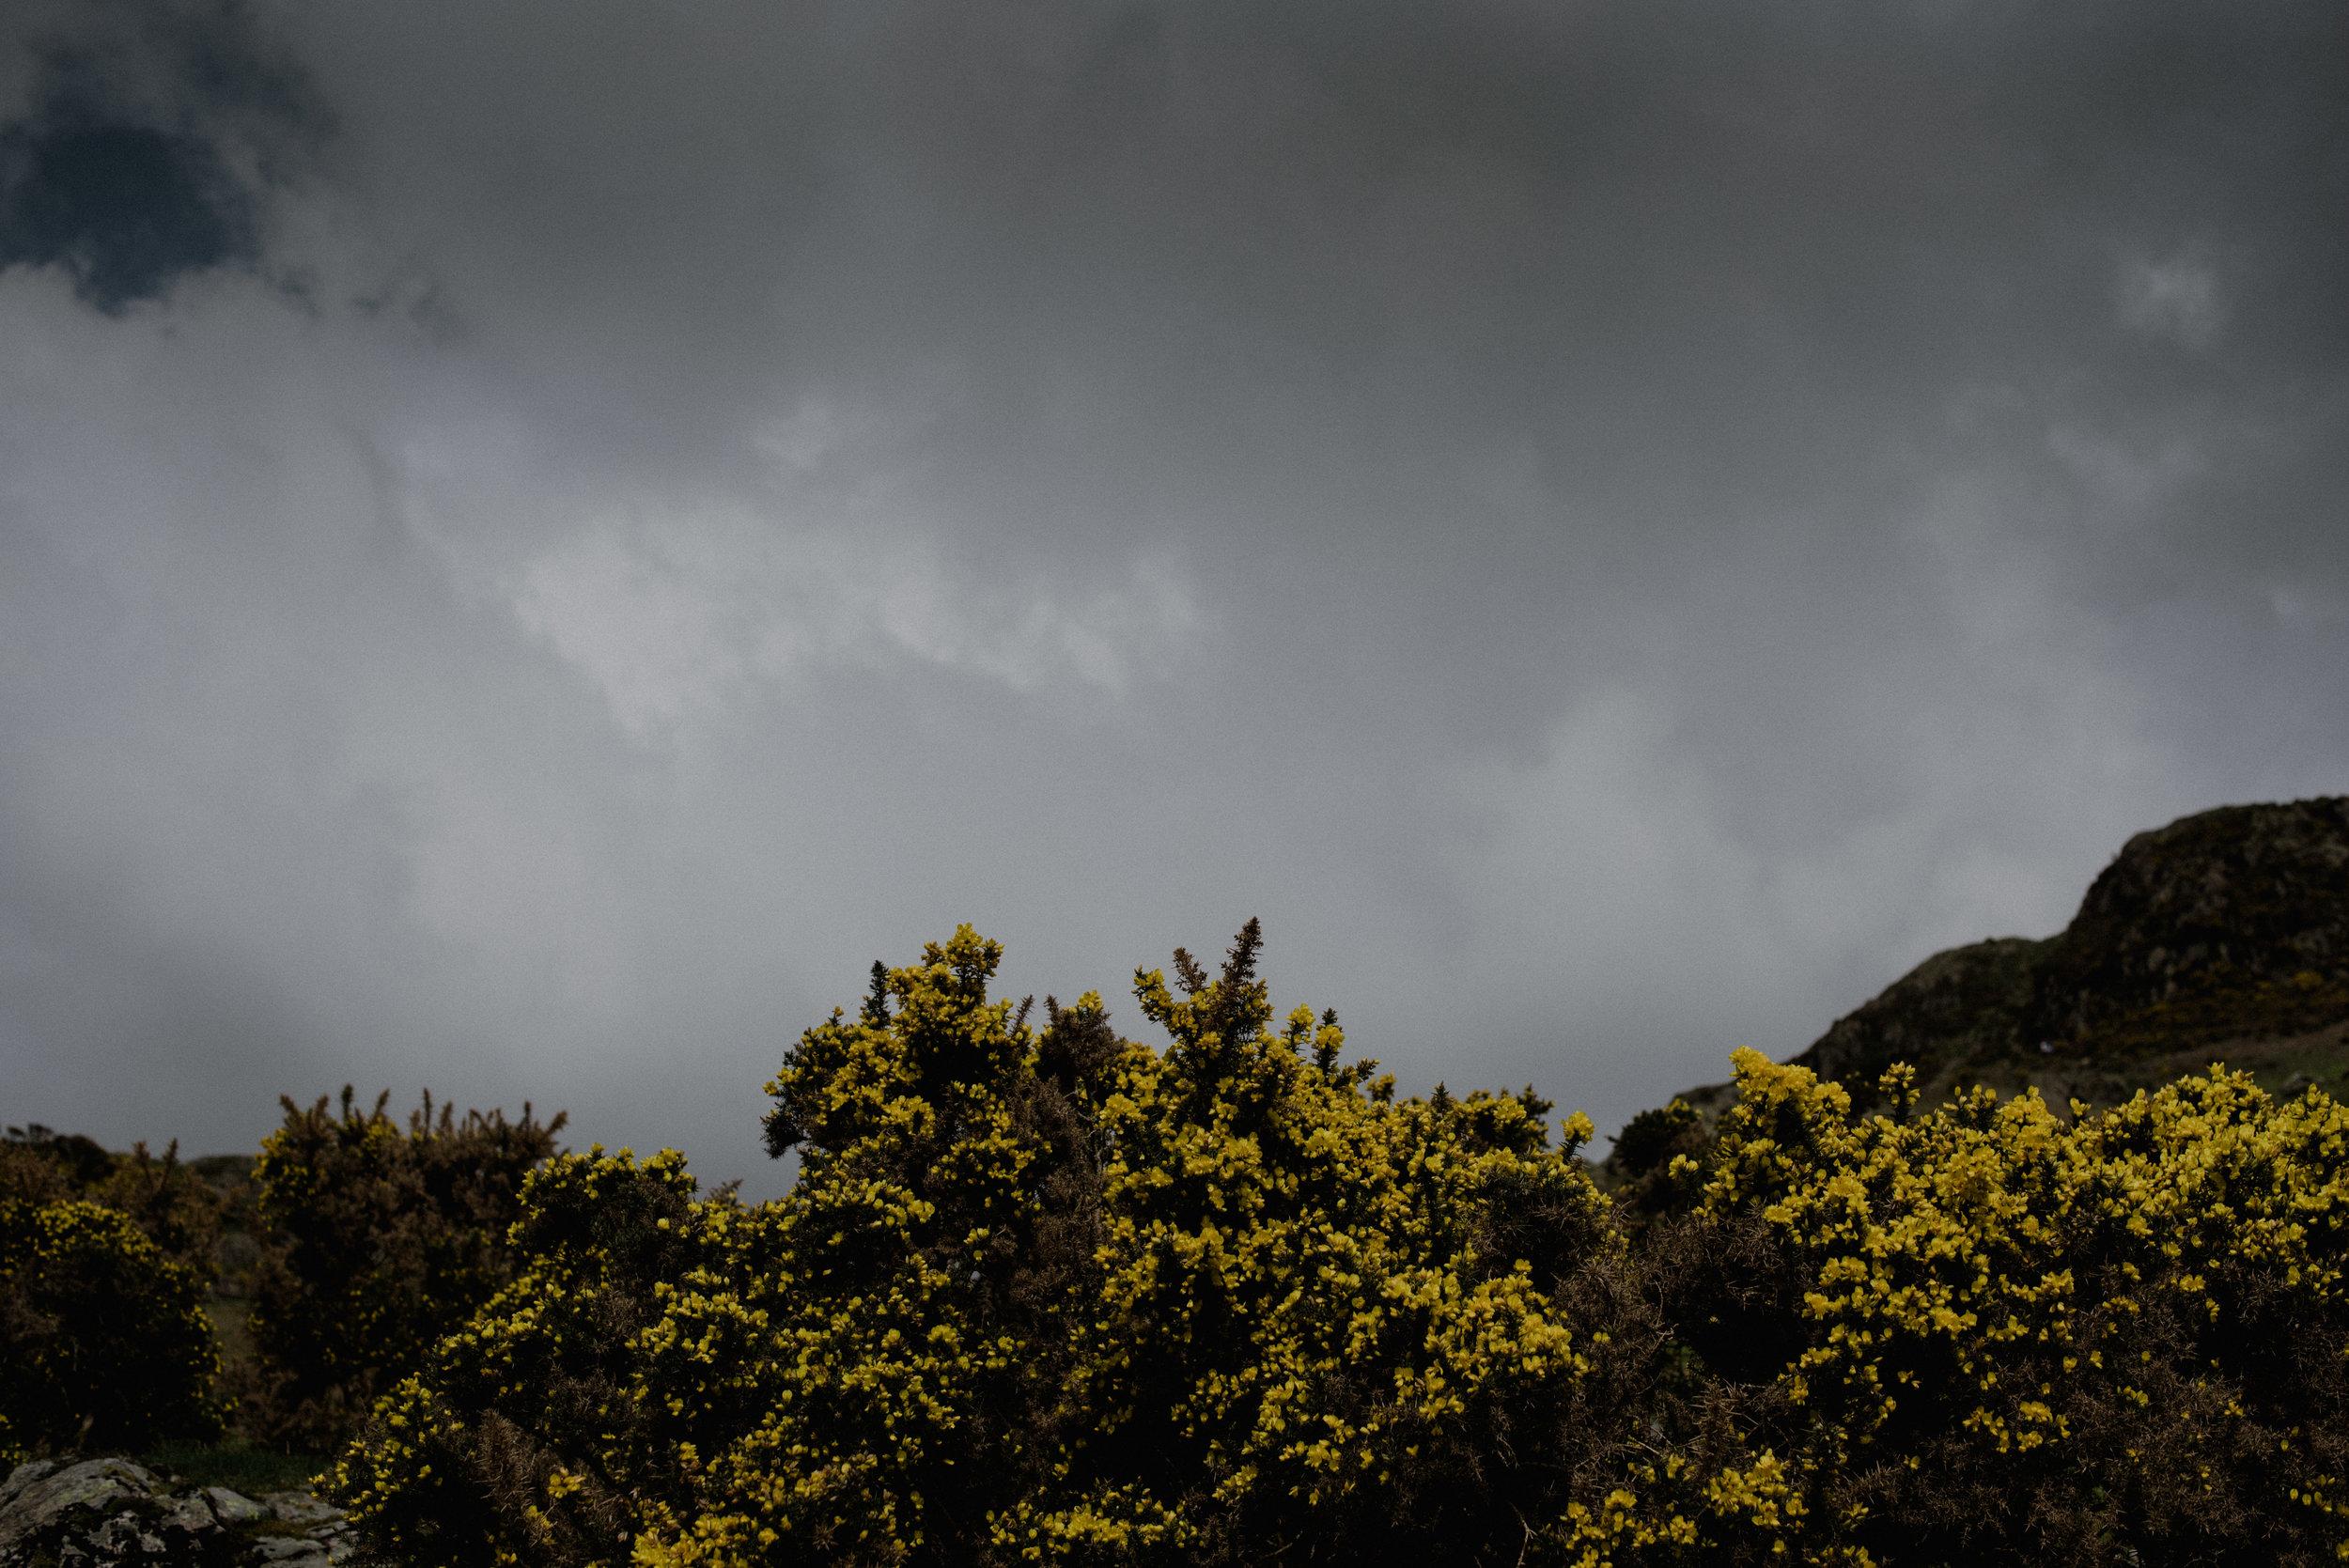 Pura Vida Cornwall Jordana & Ben-37.jpg